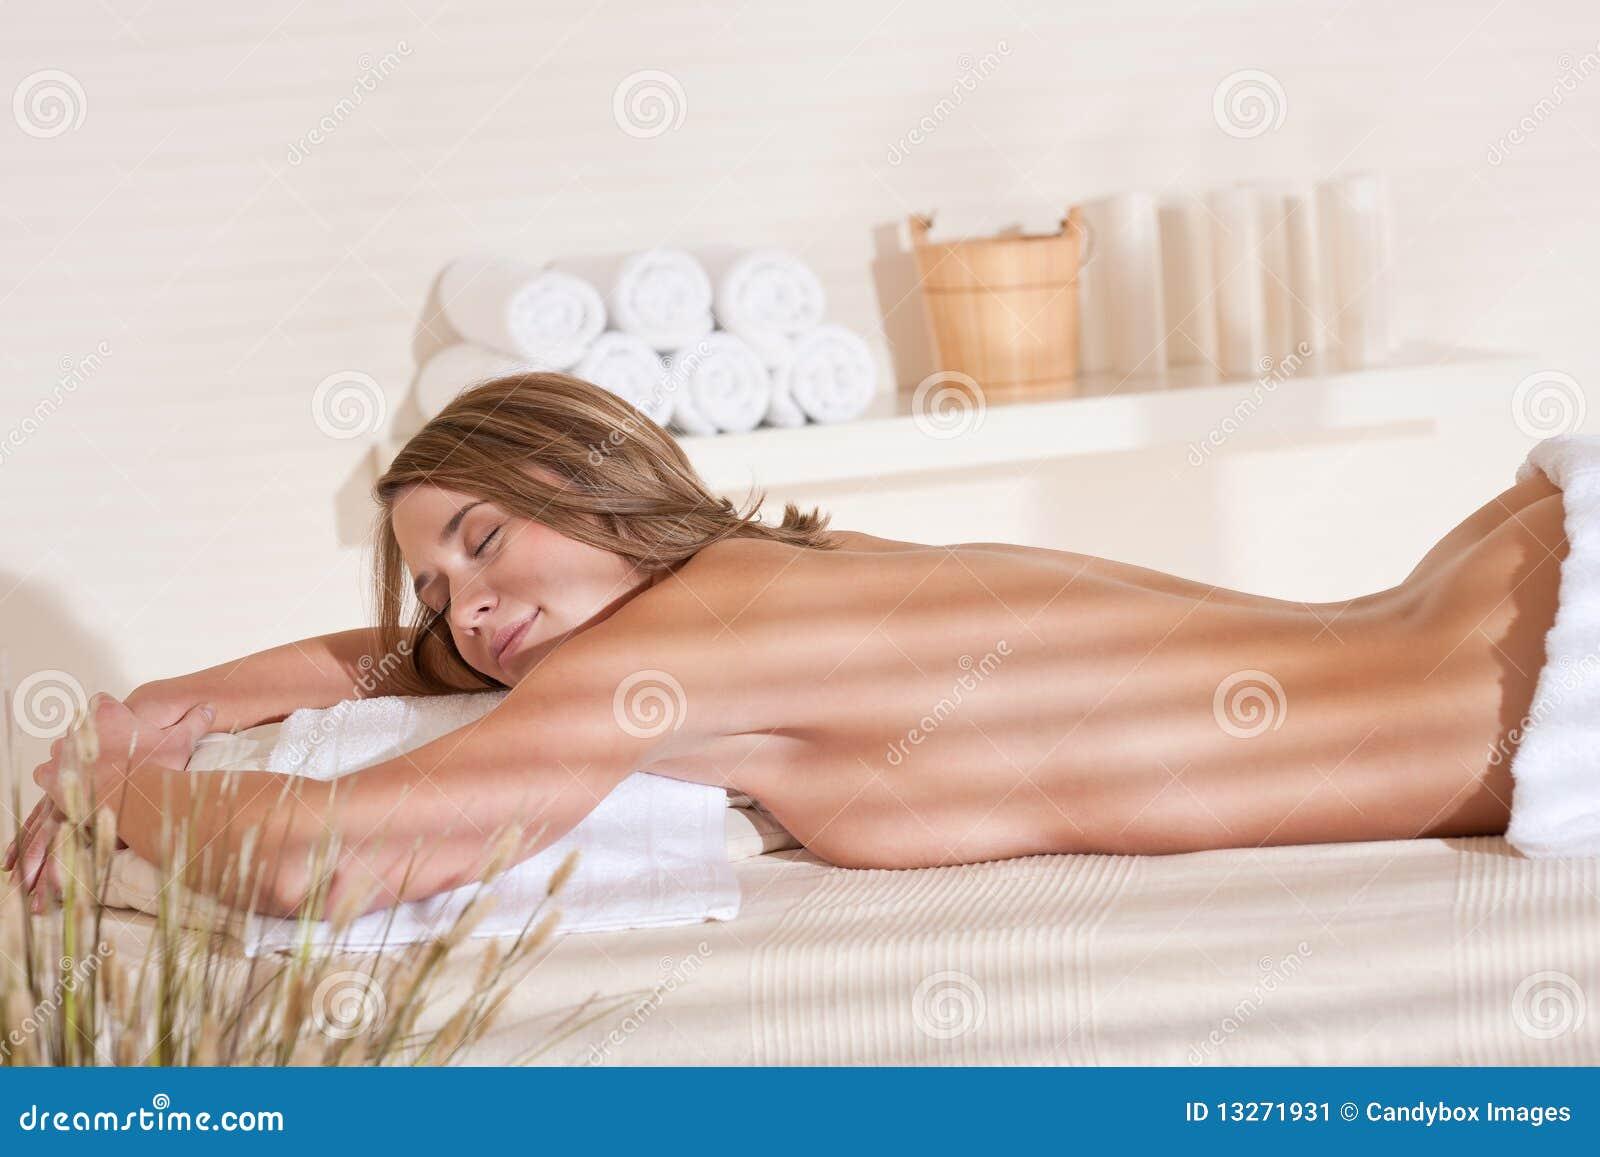 Virgo man scorpio woman dating